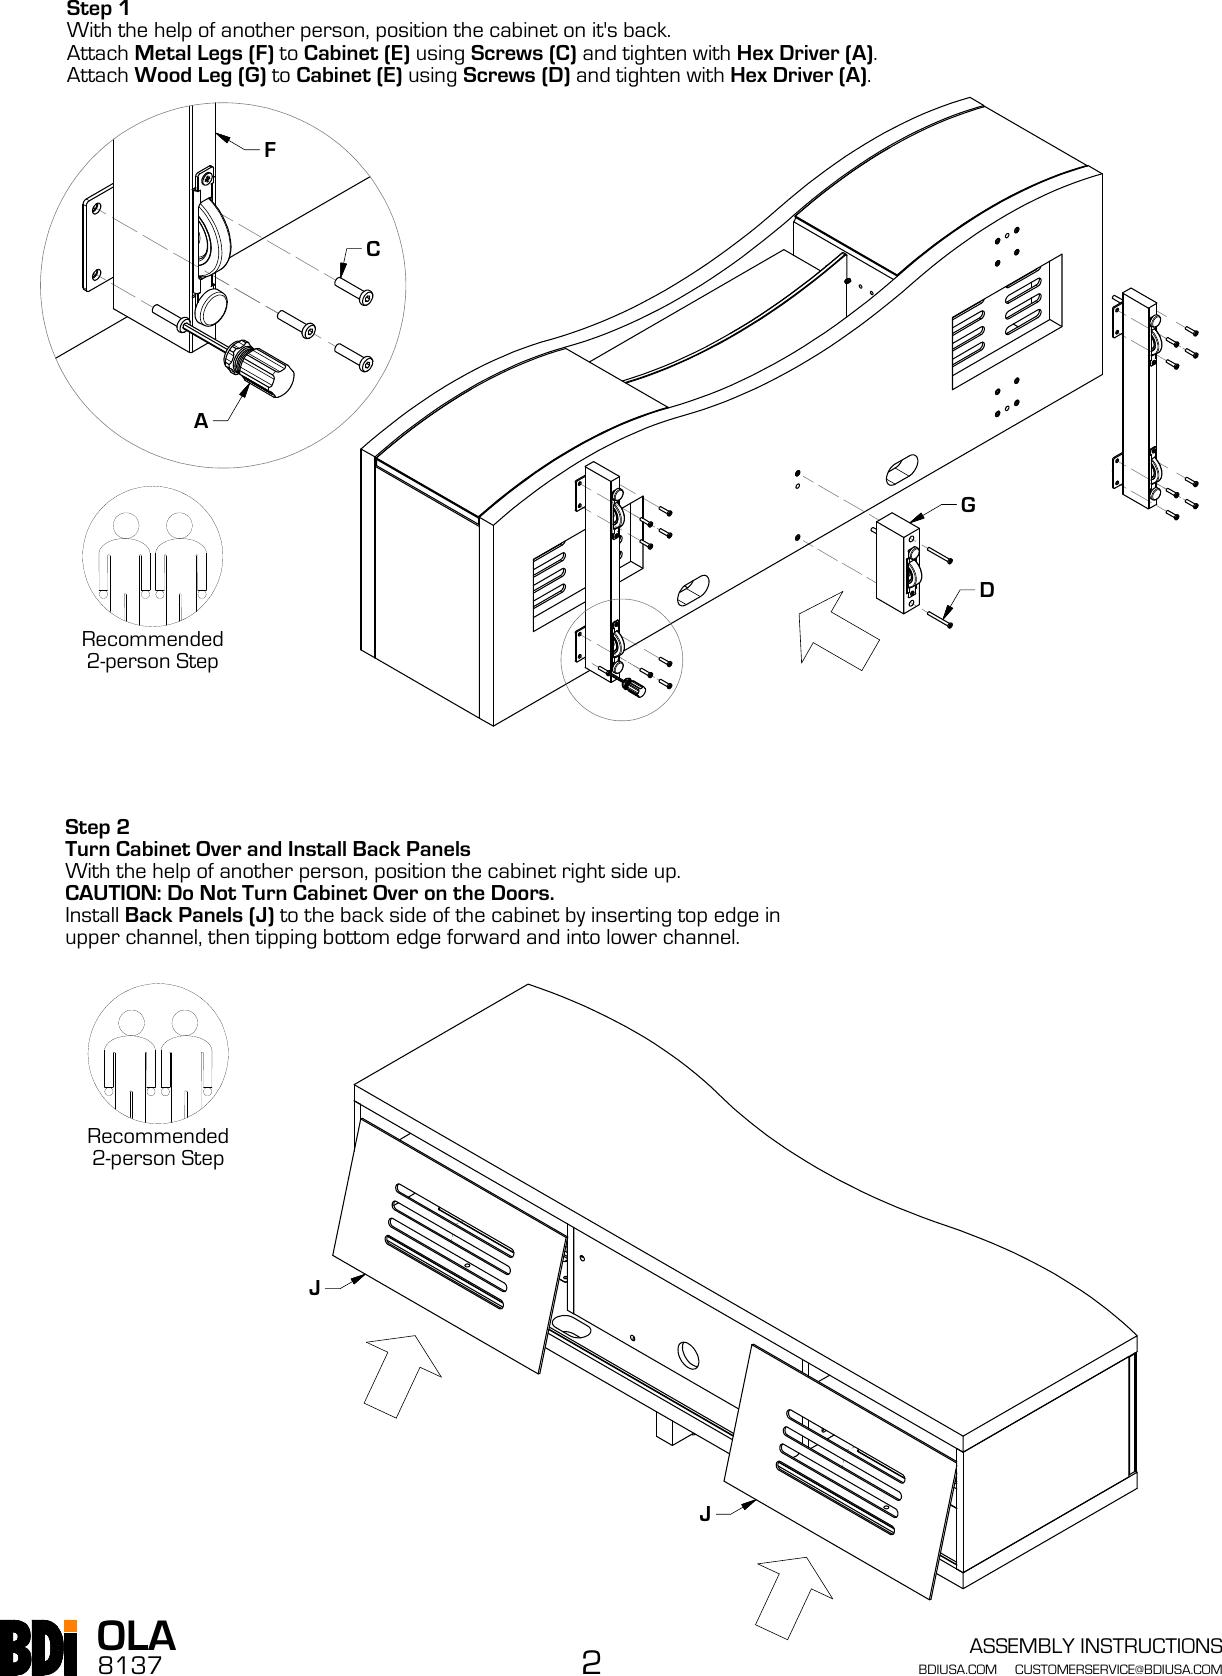 Ola_8137 dwg Ola 8137 Bdi Assembly Instructions